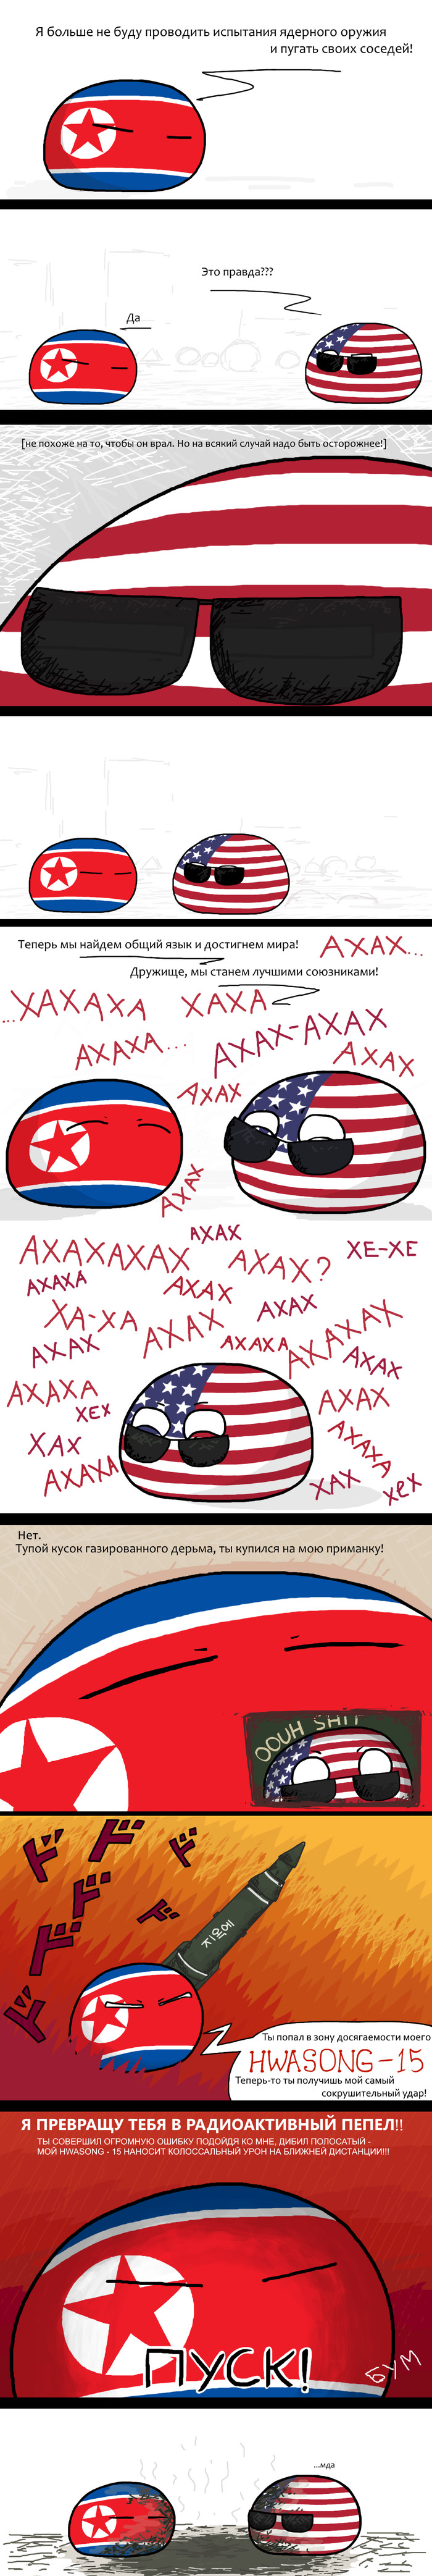 Они помирились!   Countryballs Countryballs, США и КНДР, Jojo Reference, Веб-Комикс, Политика, Длиннопост